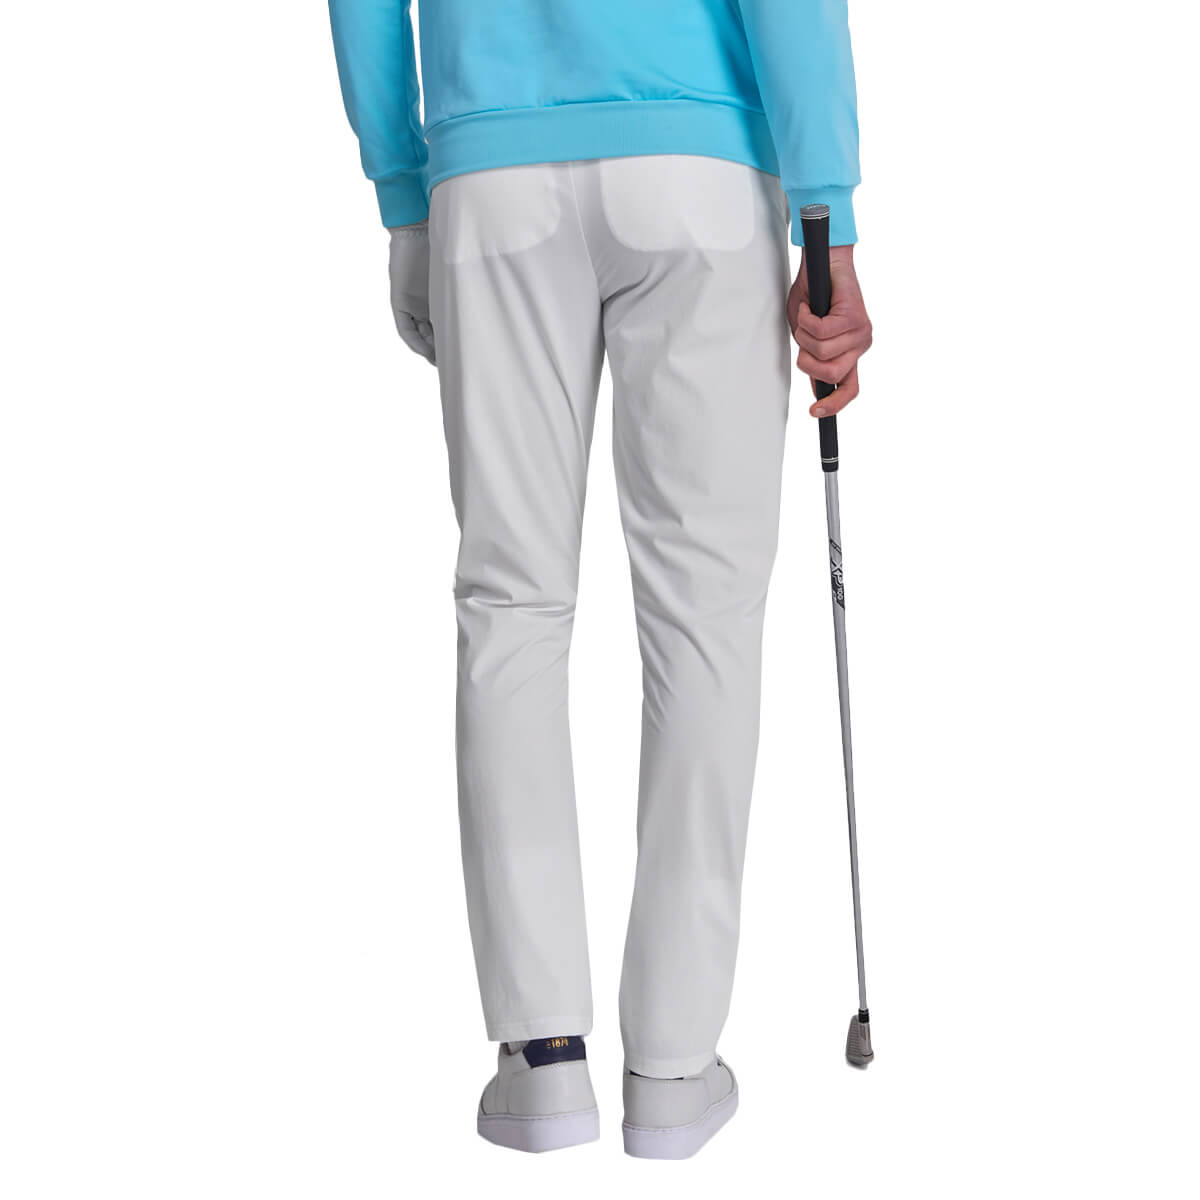 thumbnail 14 - Lyle & Scott Mens Golf Tech Light Stretch Breathable Trousers 55% OFF RRP